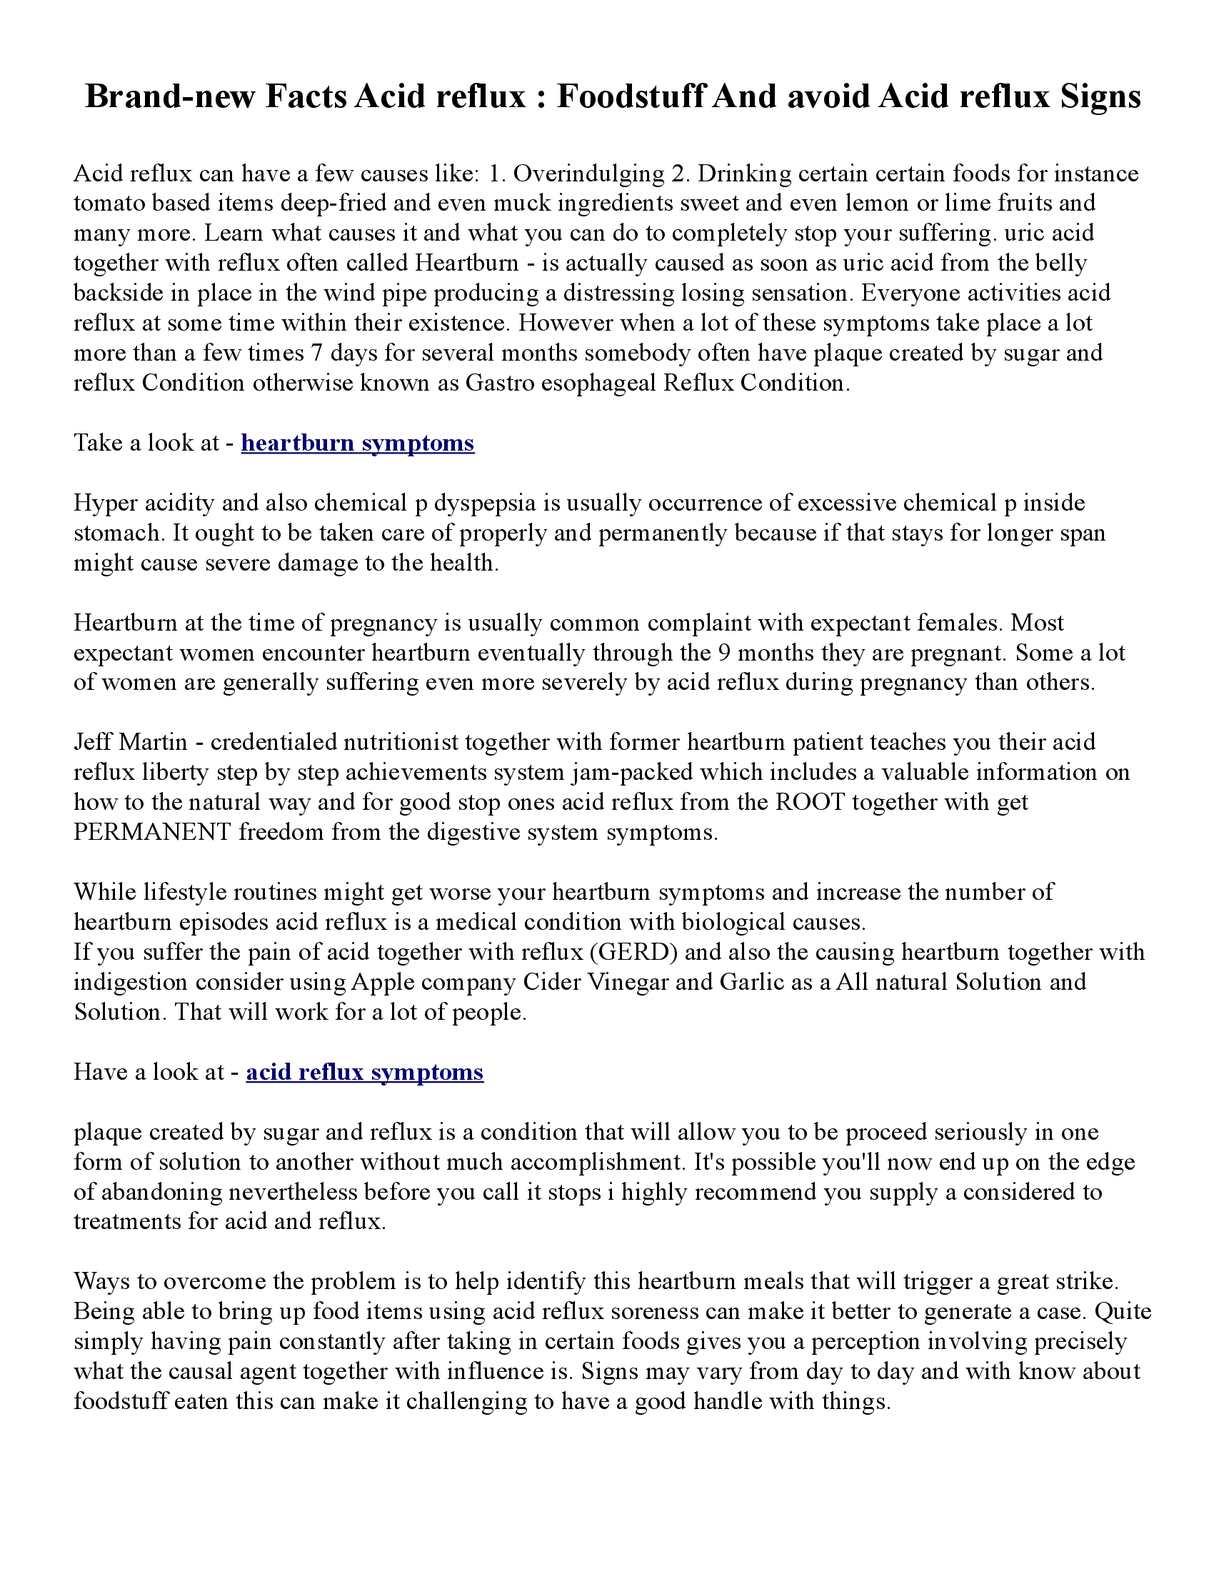 Calamo Brand New Facts Acid Reflux Foodstuff And Avoid Acid